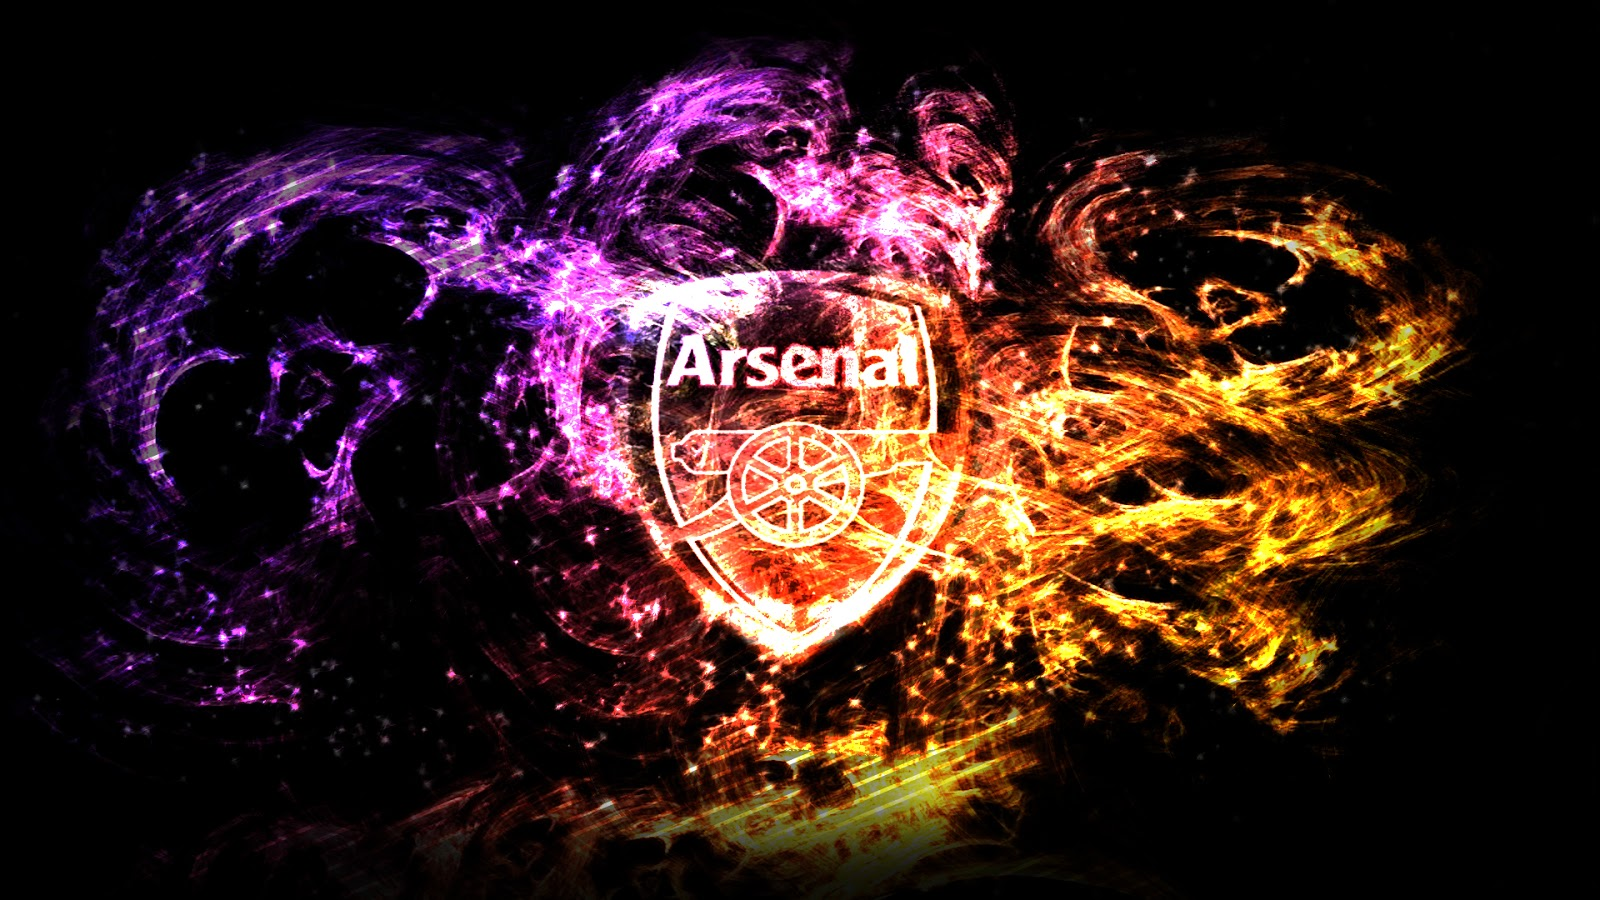 Fractal Arsenal Logo HD Wallpaper Download HD Wallpapers 1600x900